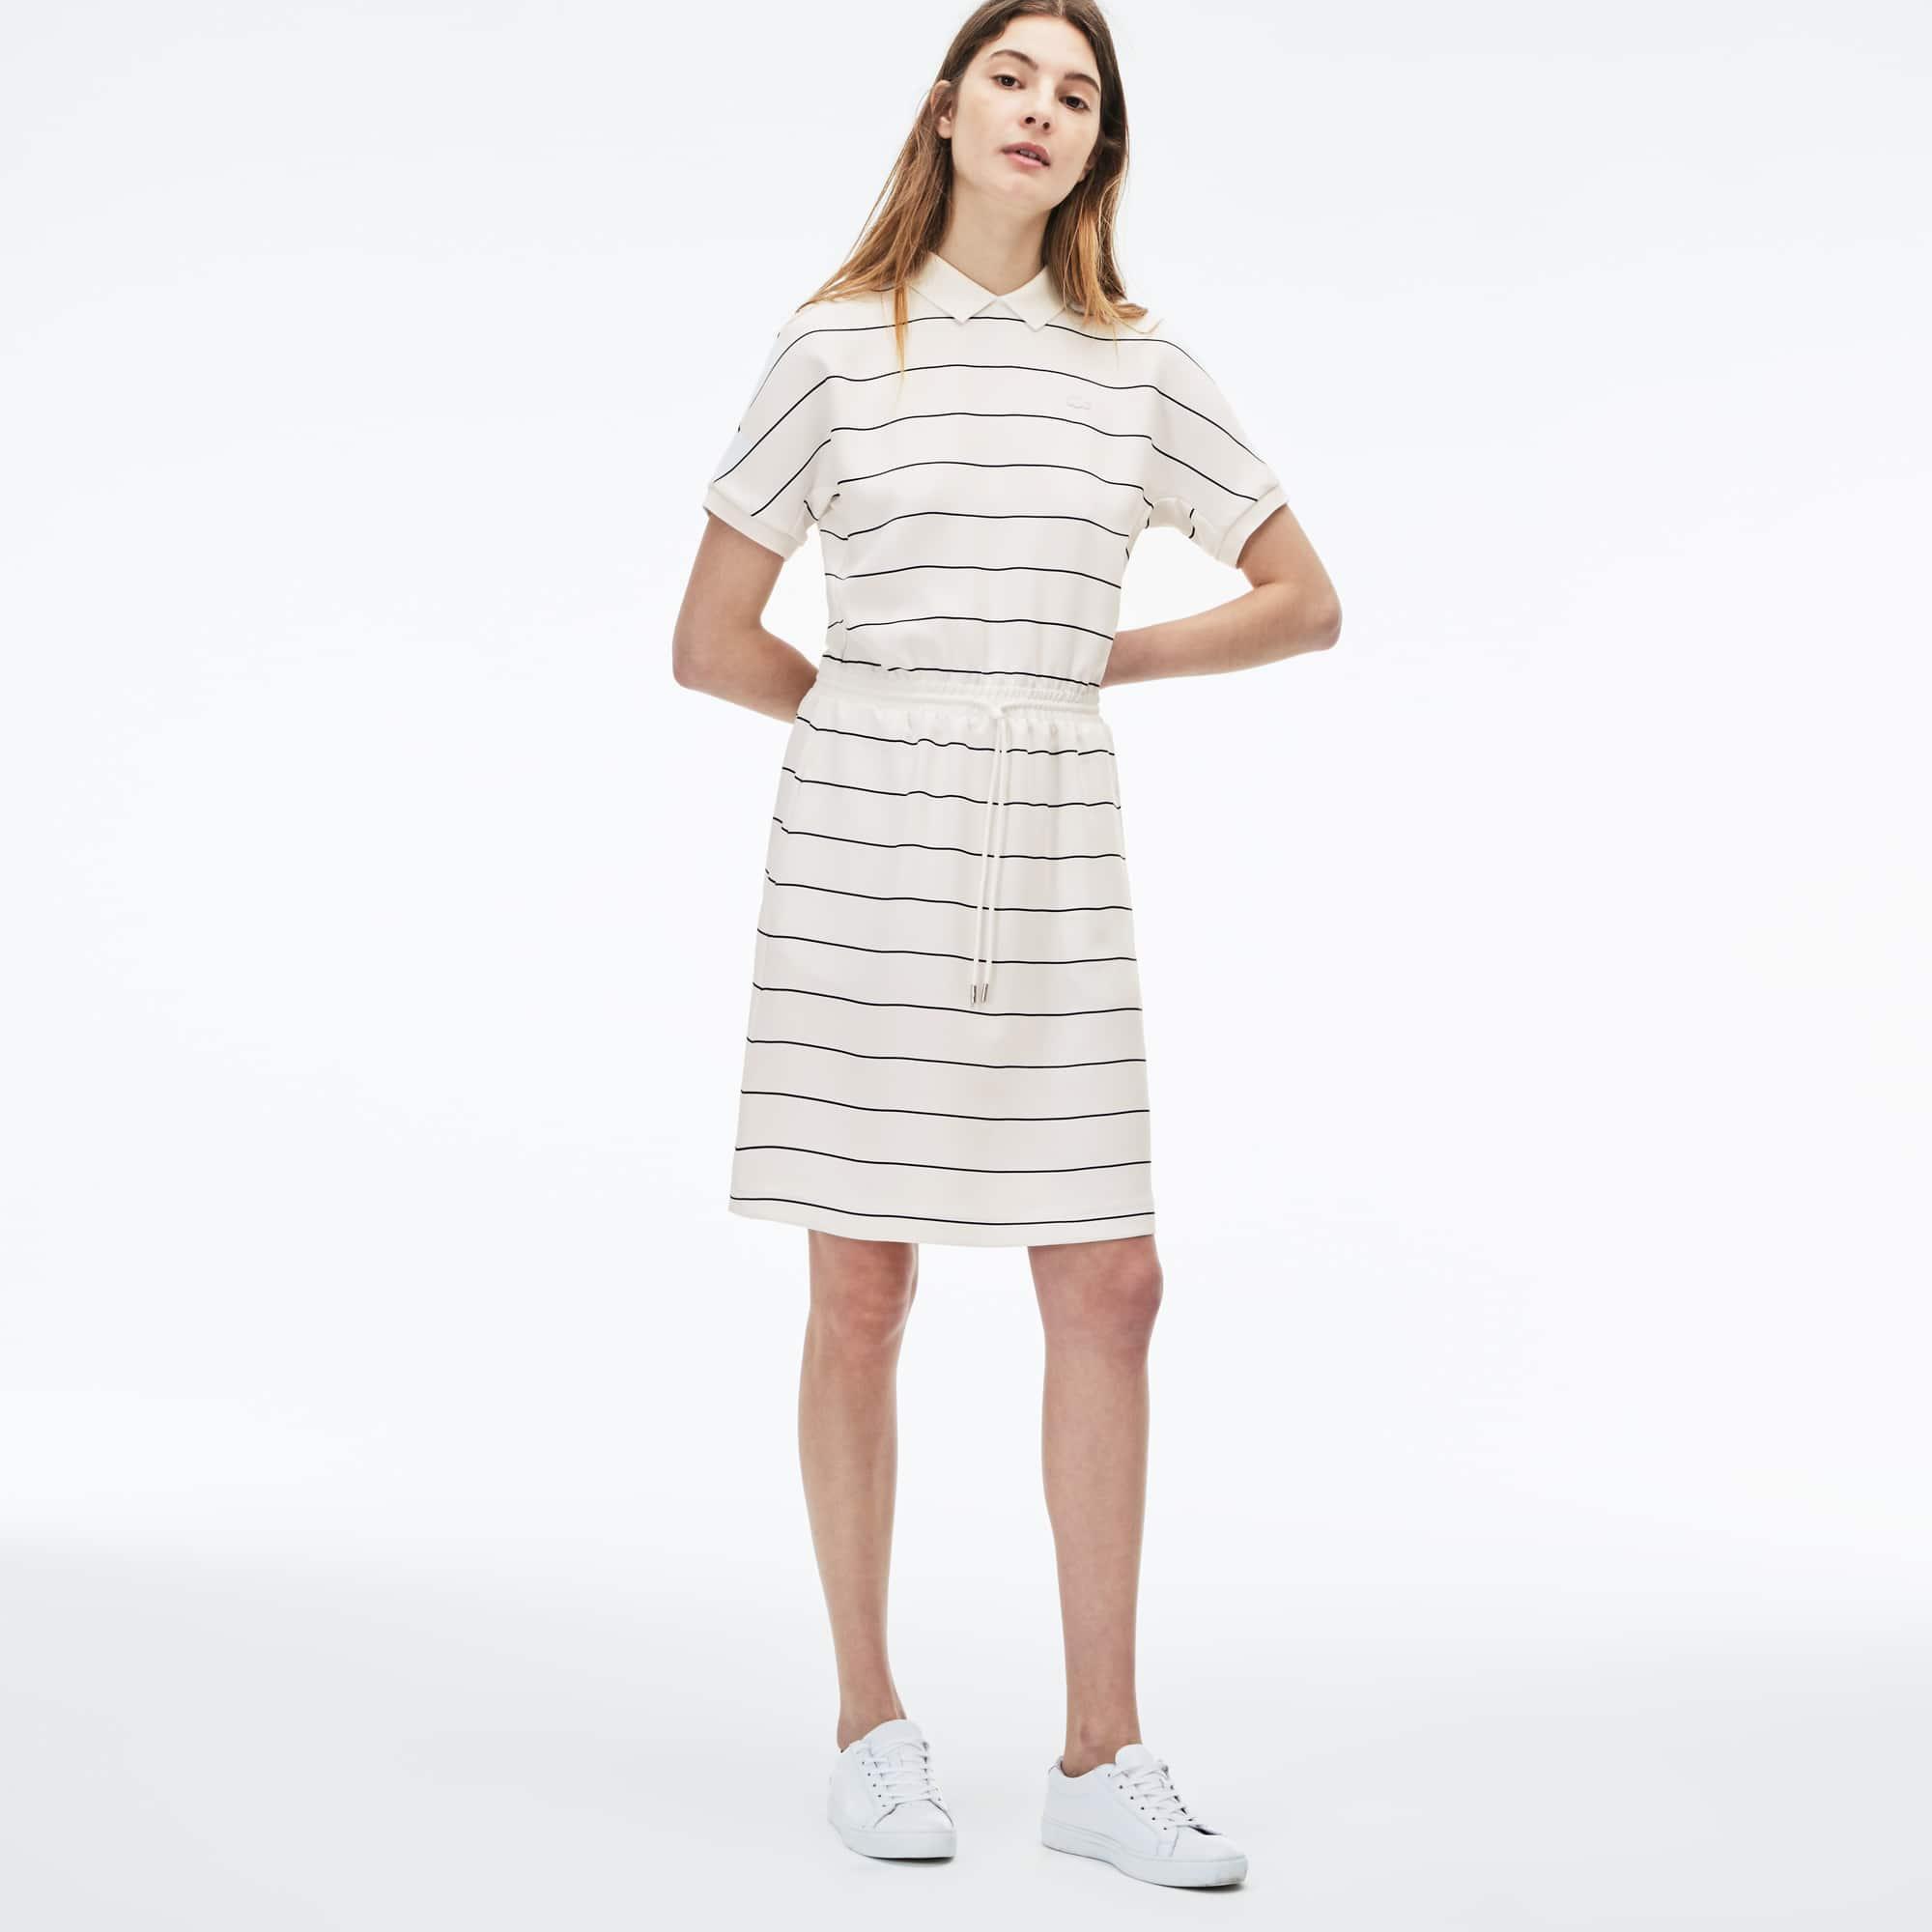 Women's Elasticized Waistband Flowing Striped Cady Knit Polo Dress